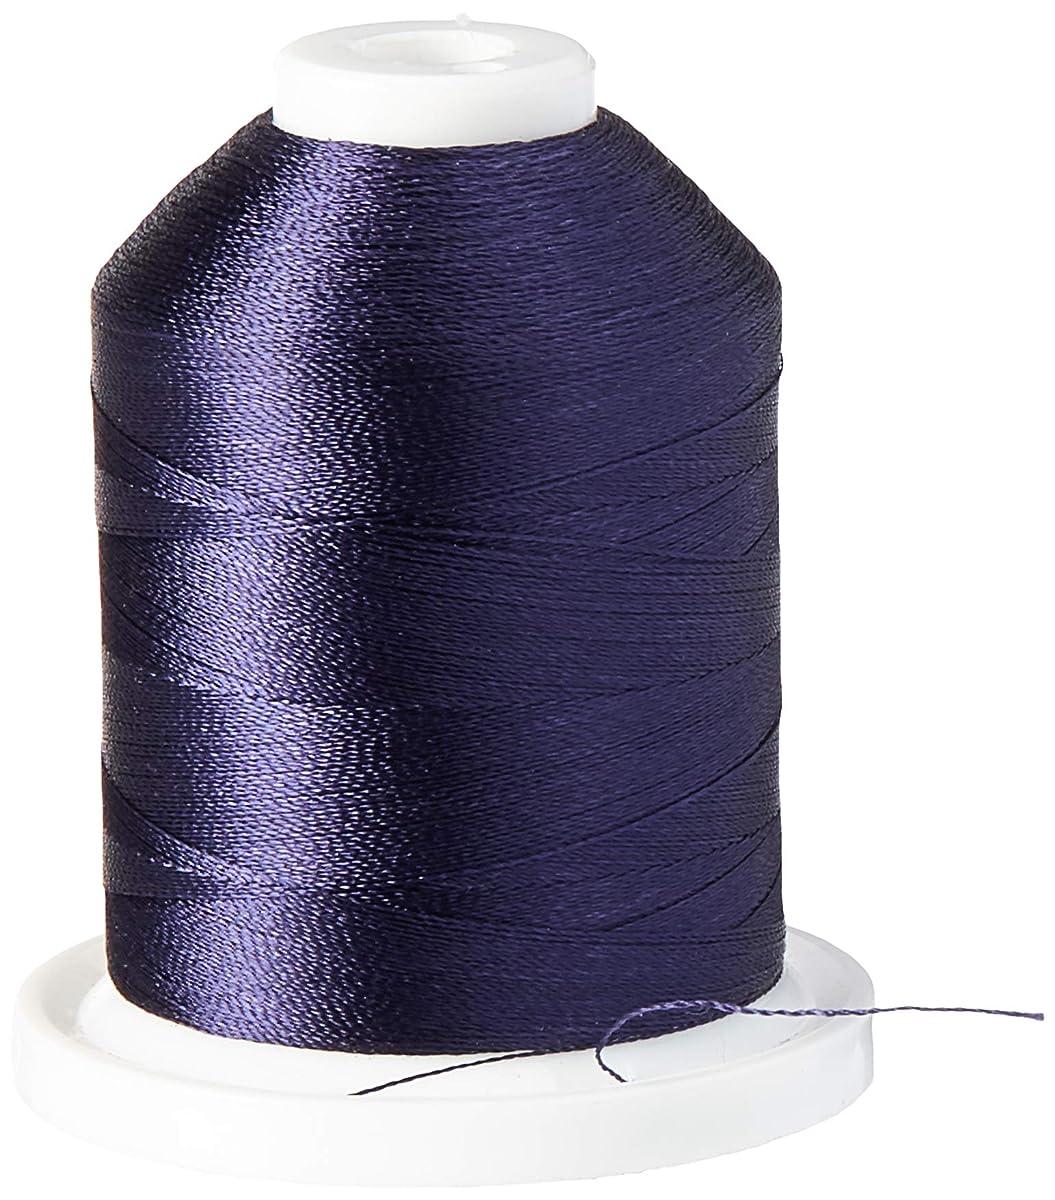 Robison-Anton Rayon Super Strength Thread, 1100-Yard, Light Midnight